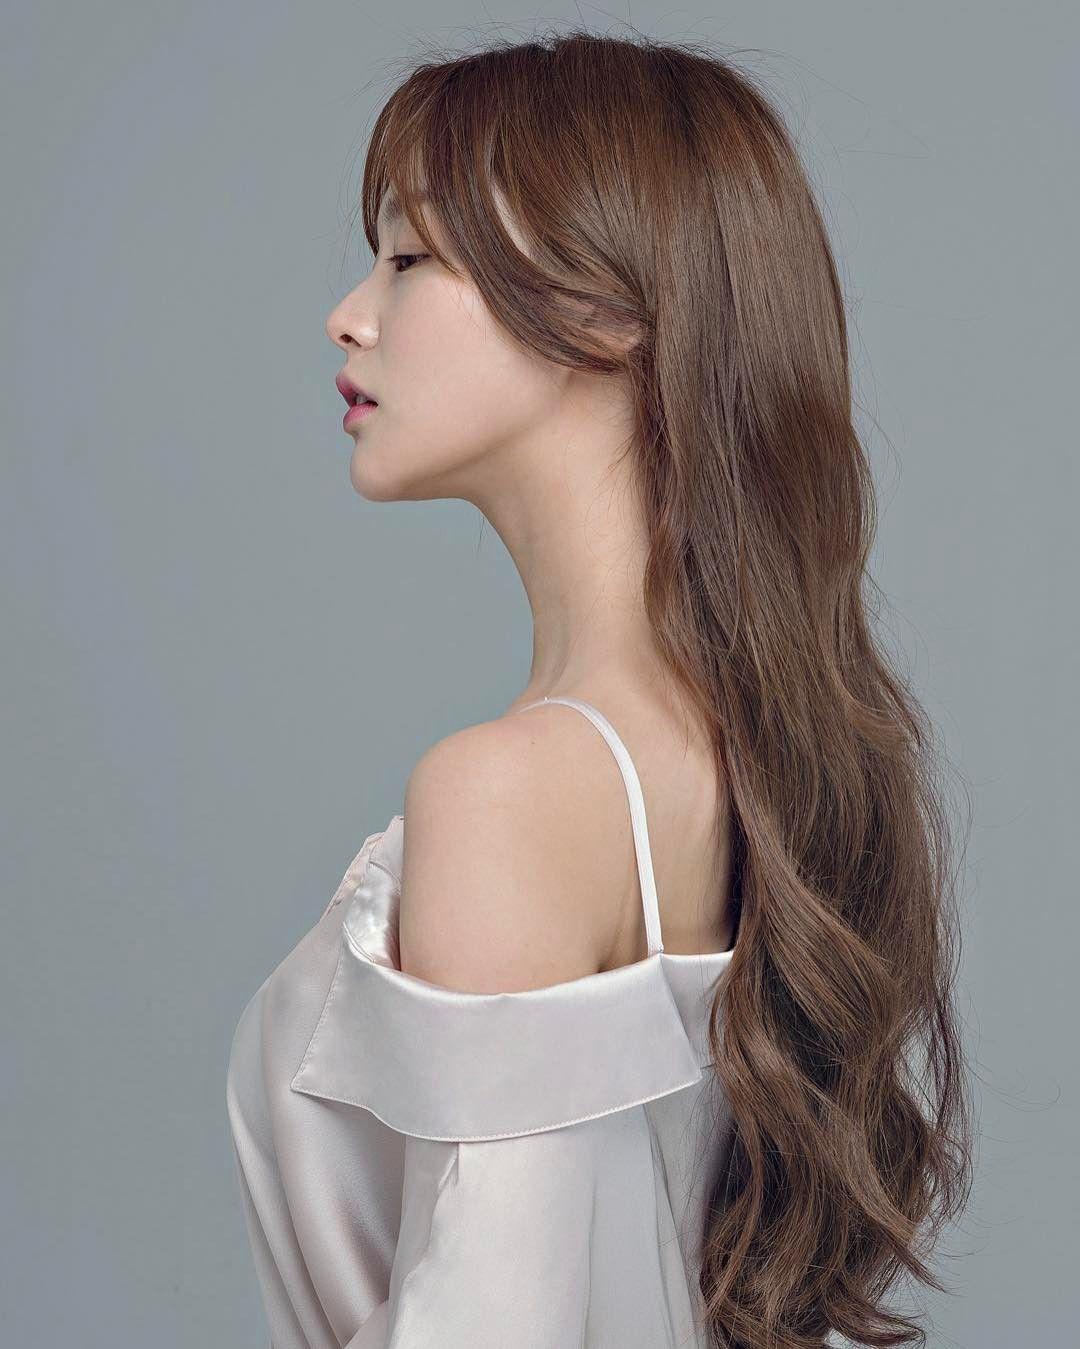 Asian Side Profile 112